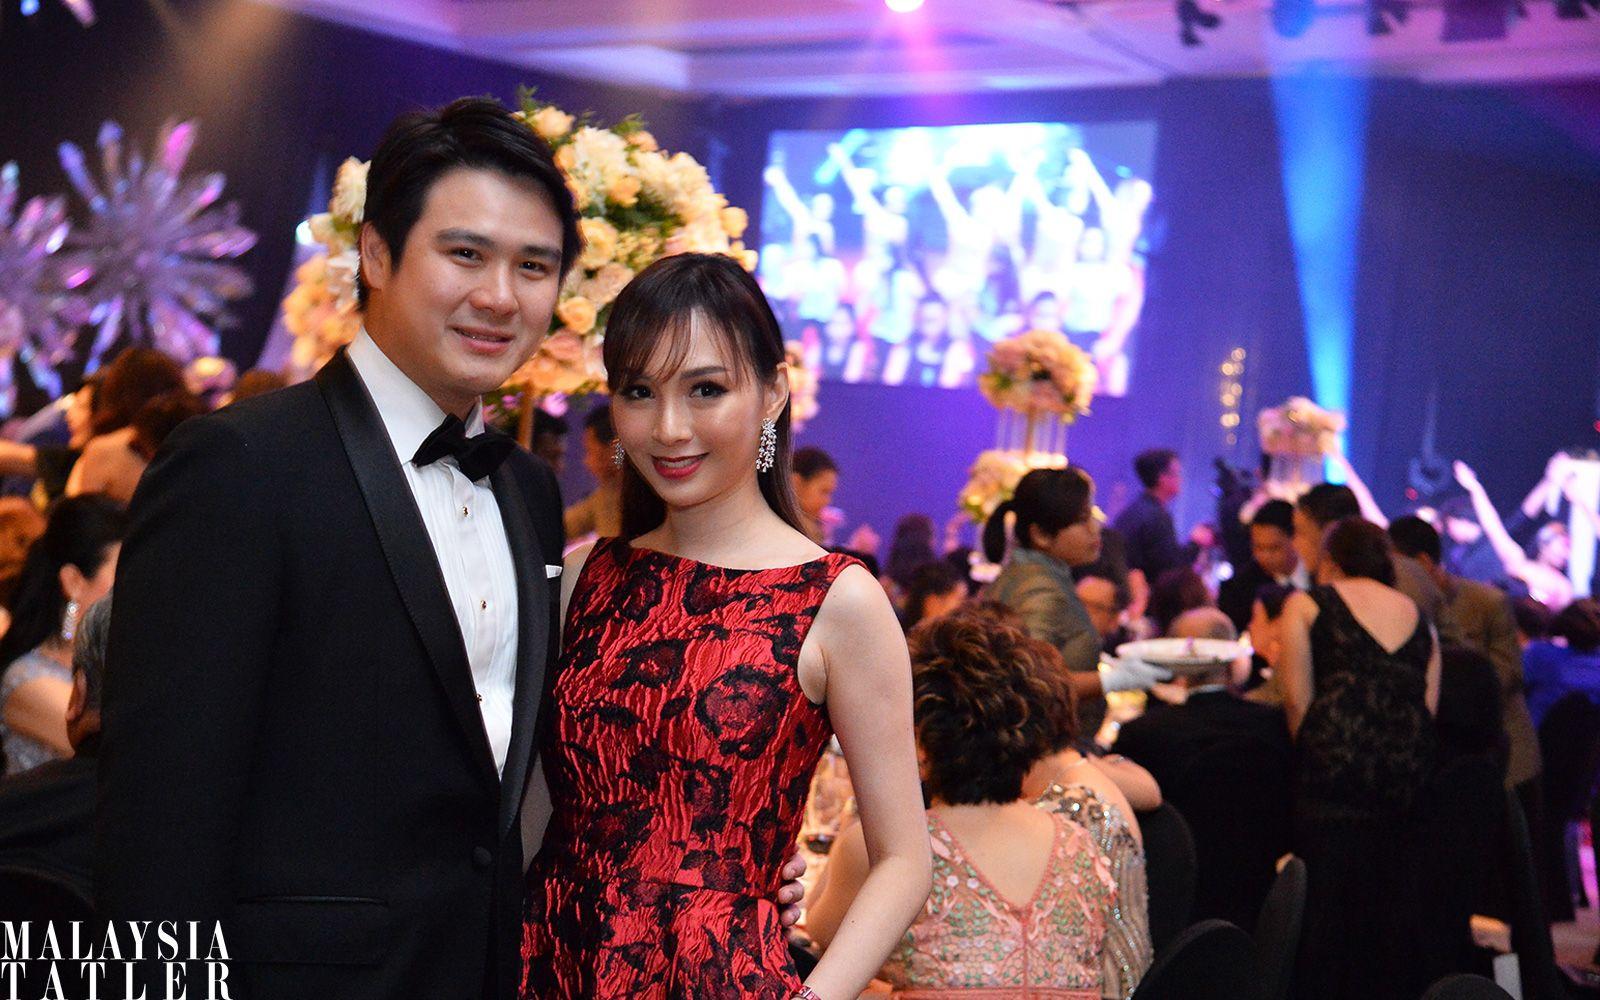 Dato' Sri Daniel Chiang and Datin Sri Linda Chen